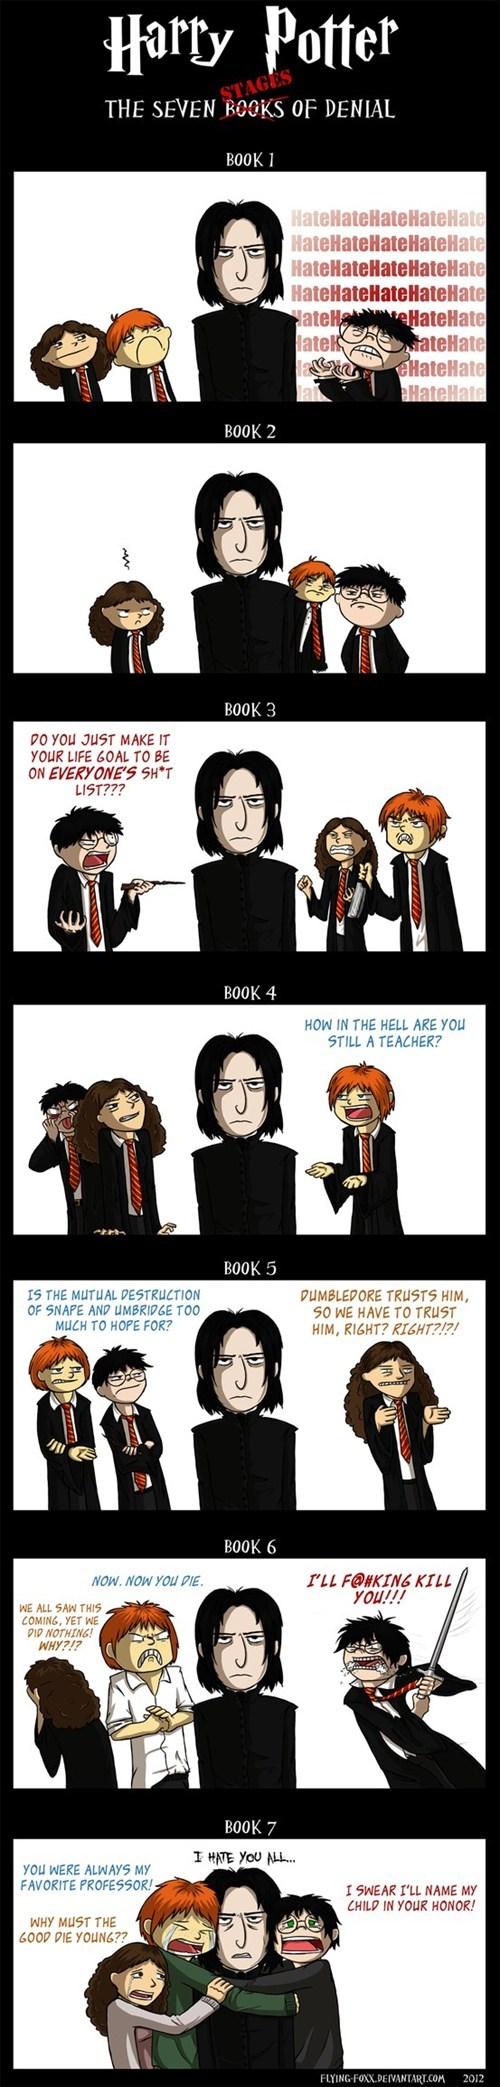 categoryvoting-page comic dumbledore Fan Art Harry Potter hate hermione granger Ron Weasley Severus Snape - 6636806656